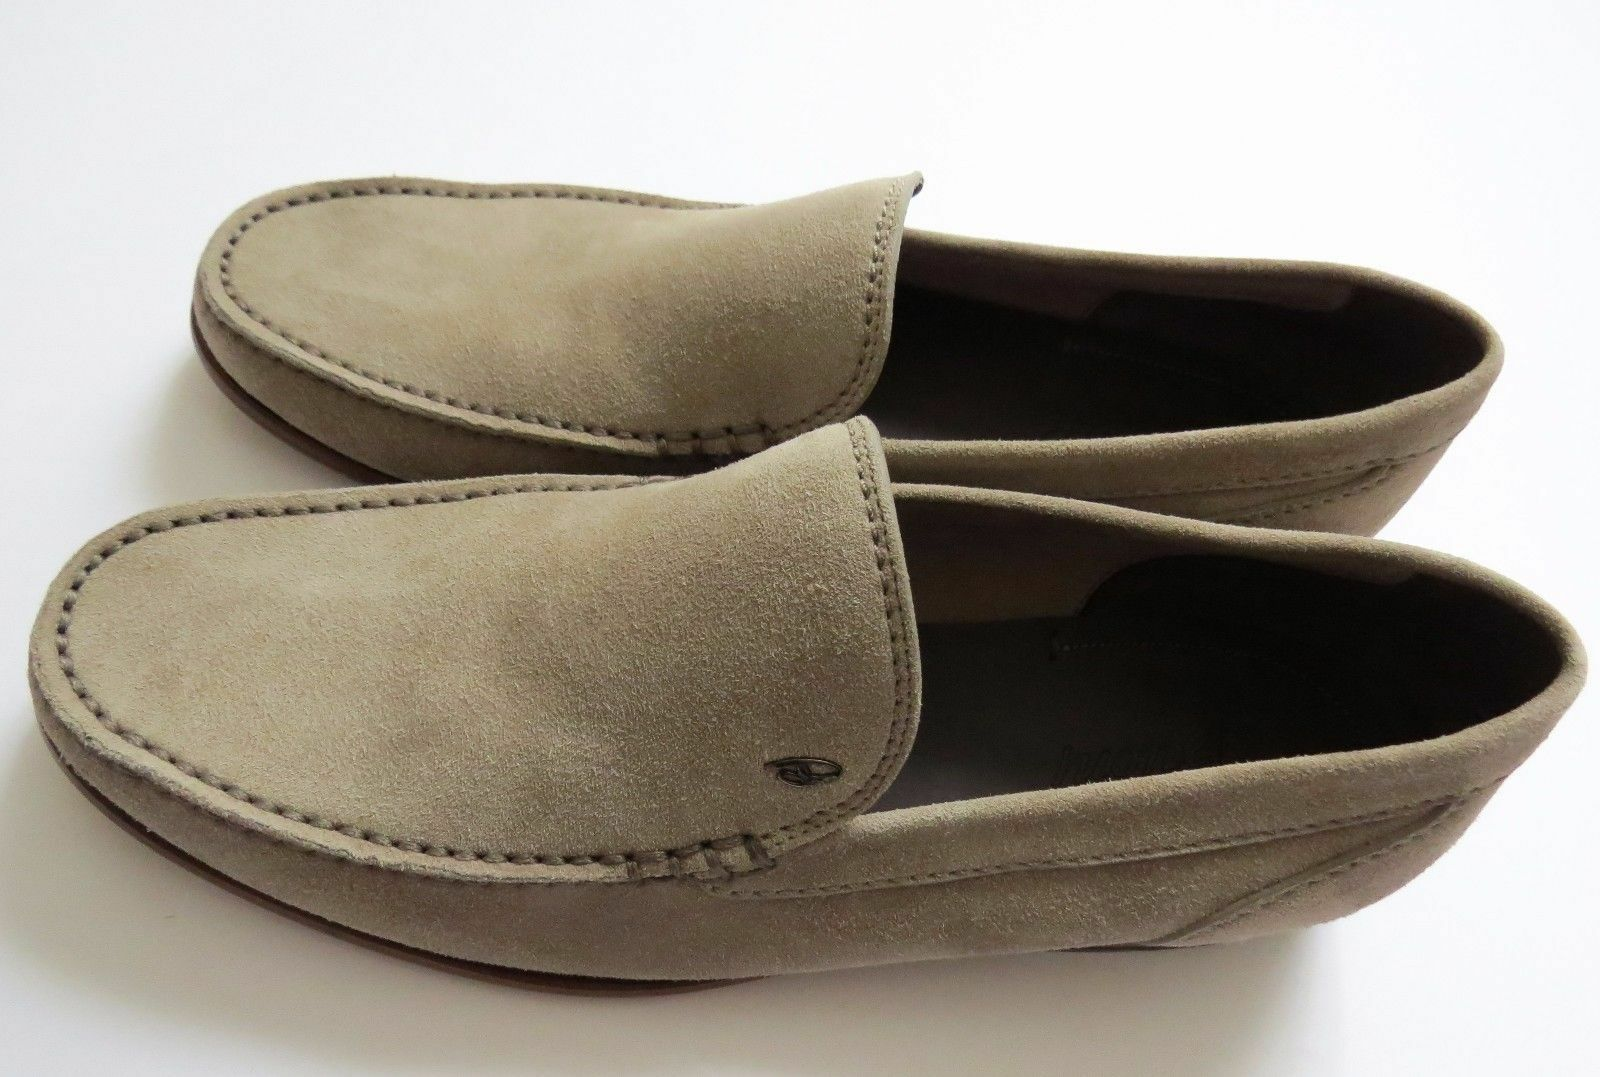 1100 BRIONI Sable Beige Daim Chaussures Mocassins Taille 10.5 US 43.5 Euro 9.5 UK